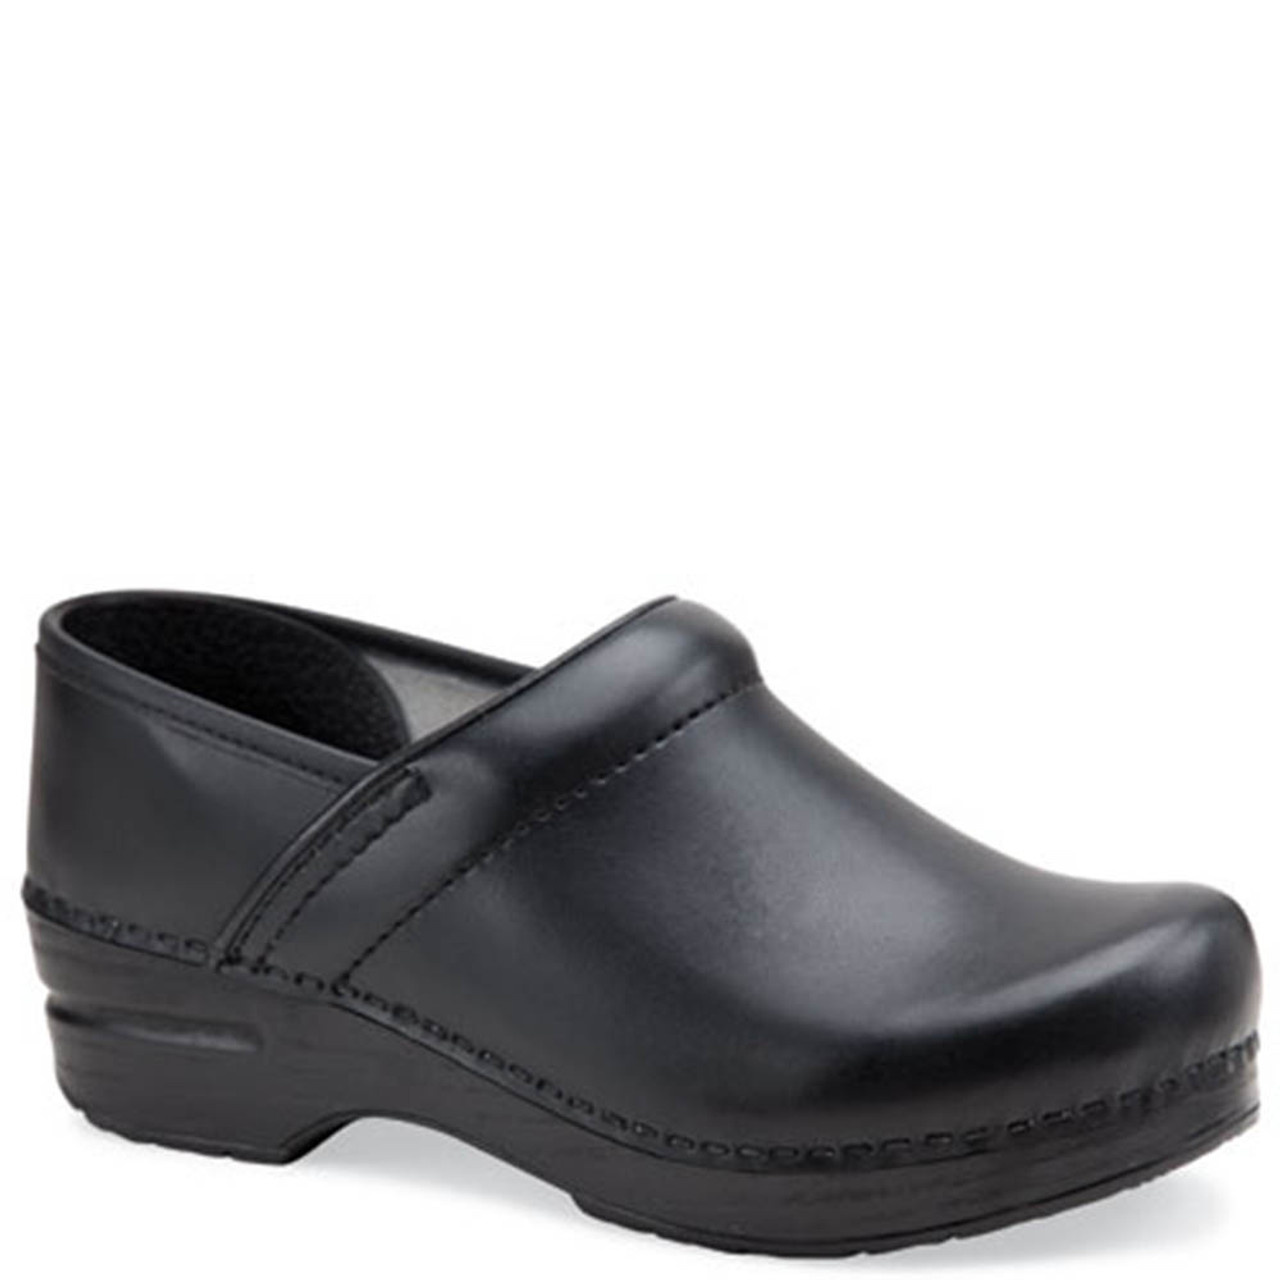 0ebb8ae93d750 Dansko BLACK BOX Professional Clogs - Family Footwear Center